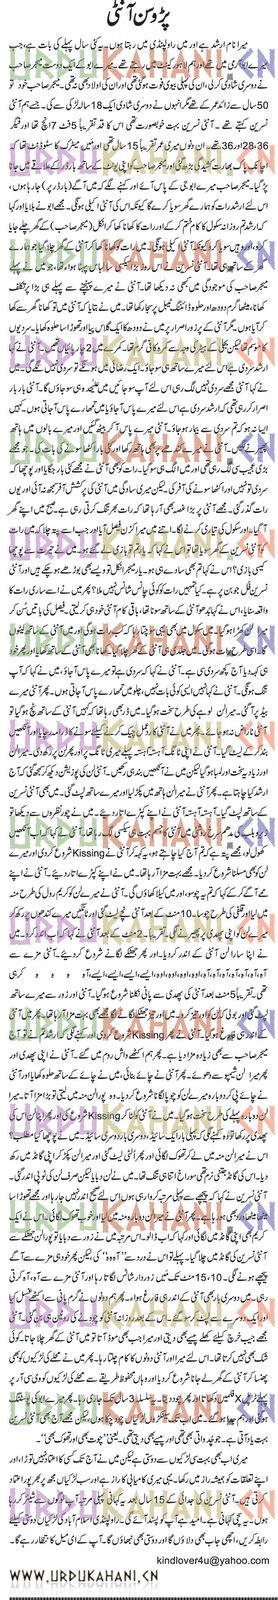 anti k sath urdu sex stories picture 8